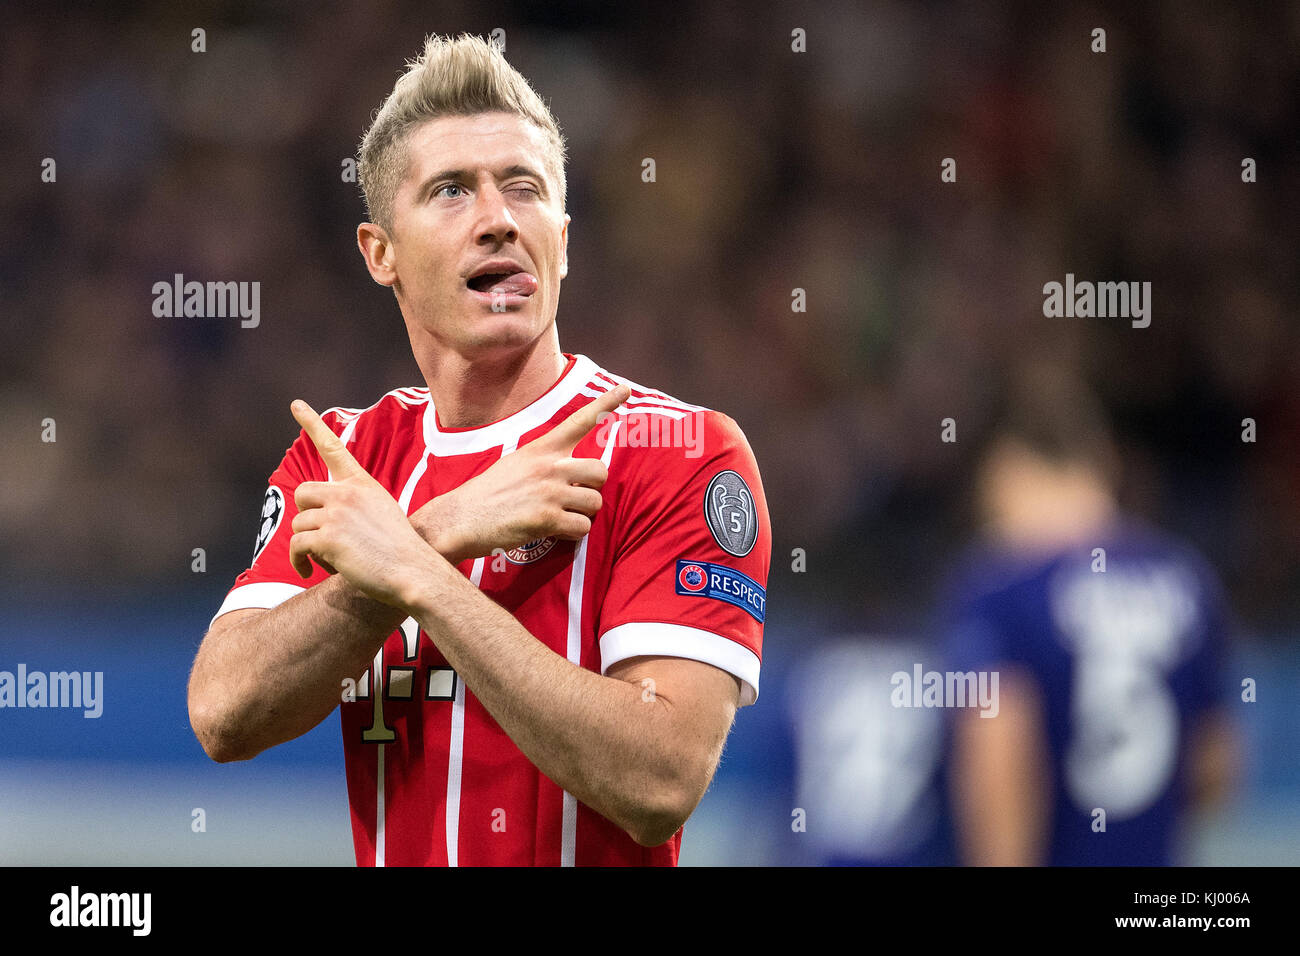 Munich's Robert Lewandowski celebrates after scoring the 1-0 goal during the Champions League soccer match between - Stock Image